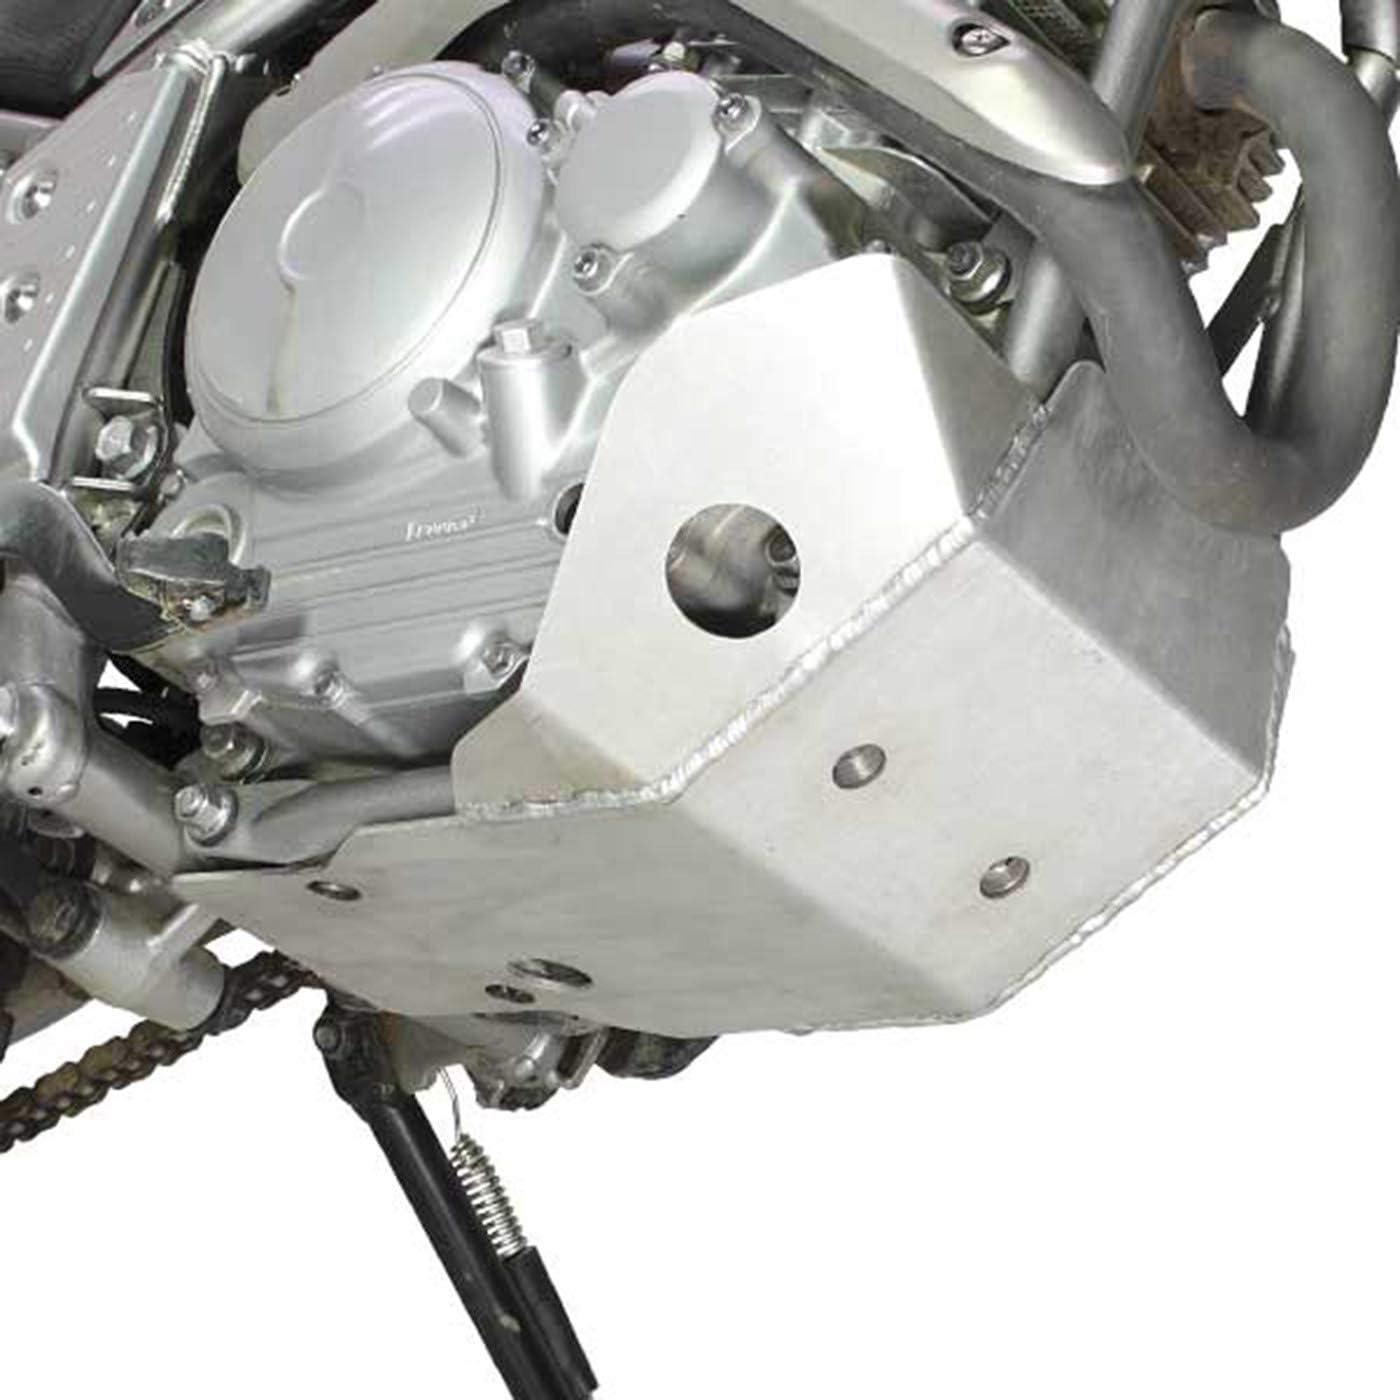 Selo XT250X ZE55-2420 ZETA ED skid plate aluminum XT250 SEROW250